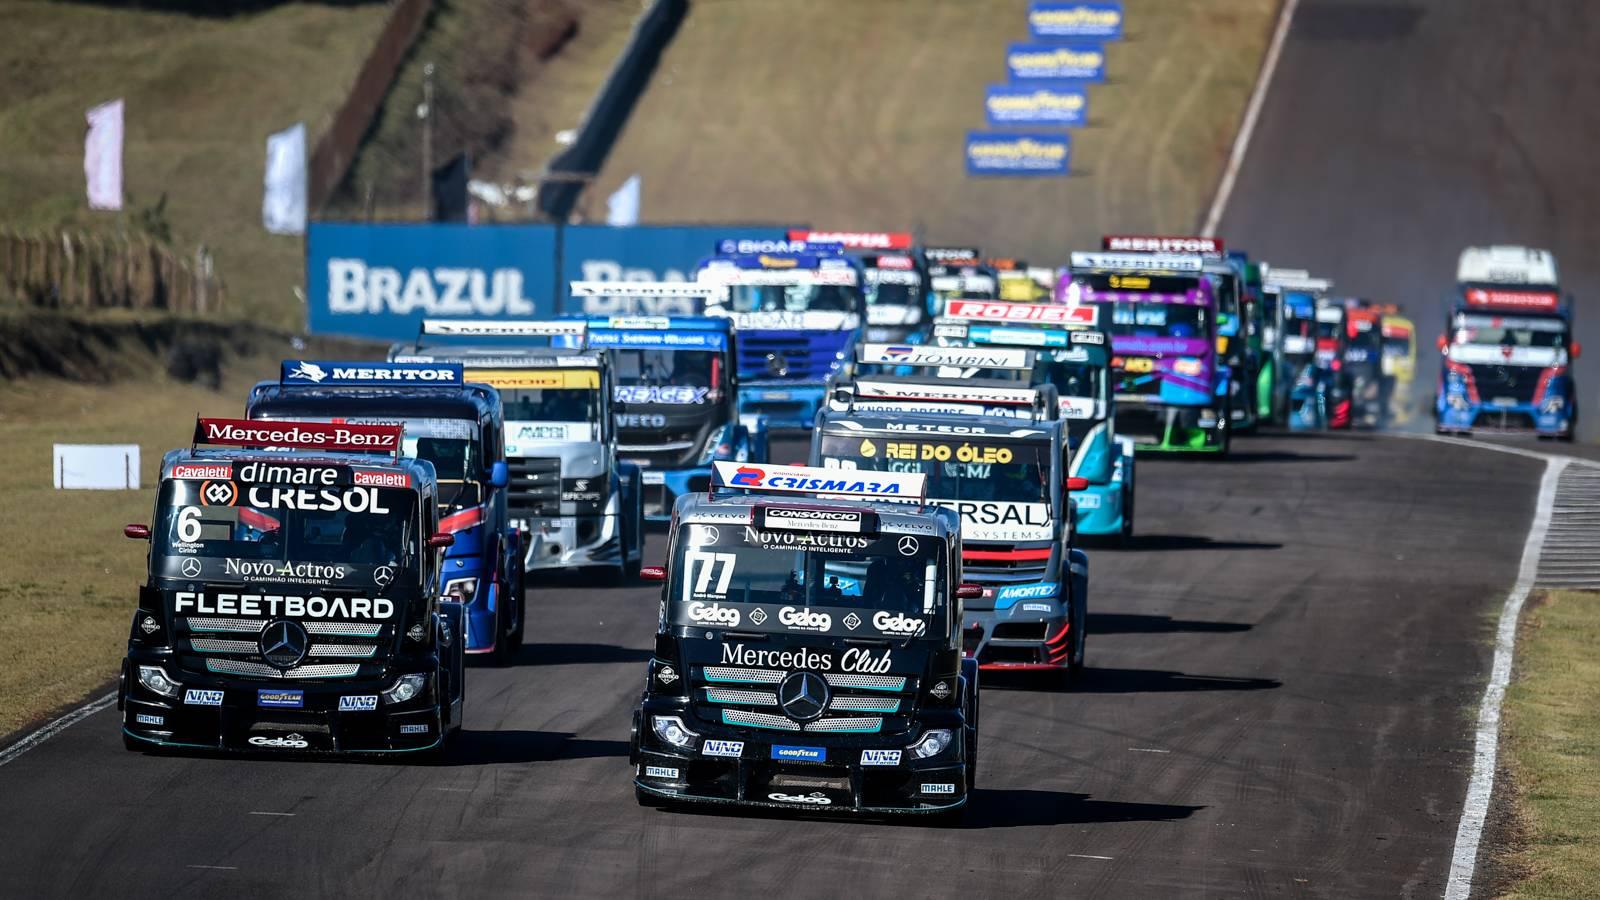 Copa Truck: André Marques e Danilo Dirani vencem novamente em Cascavel